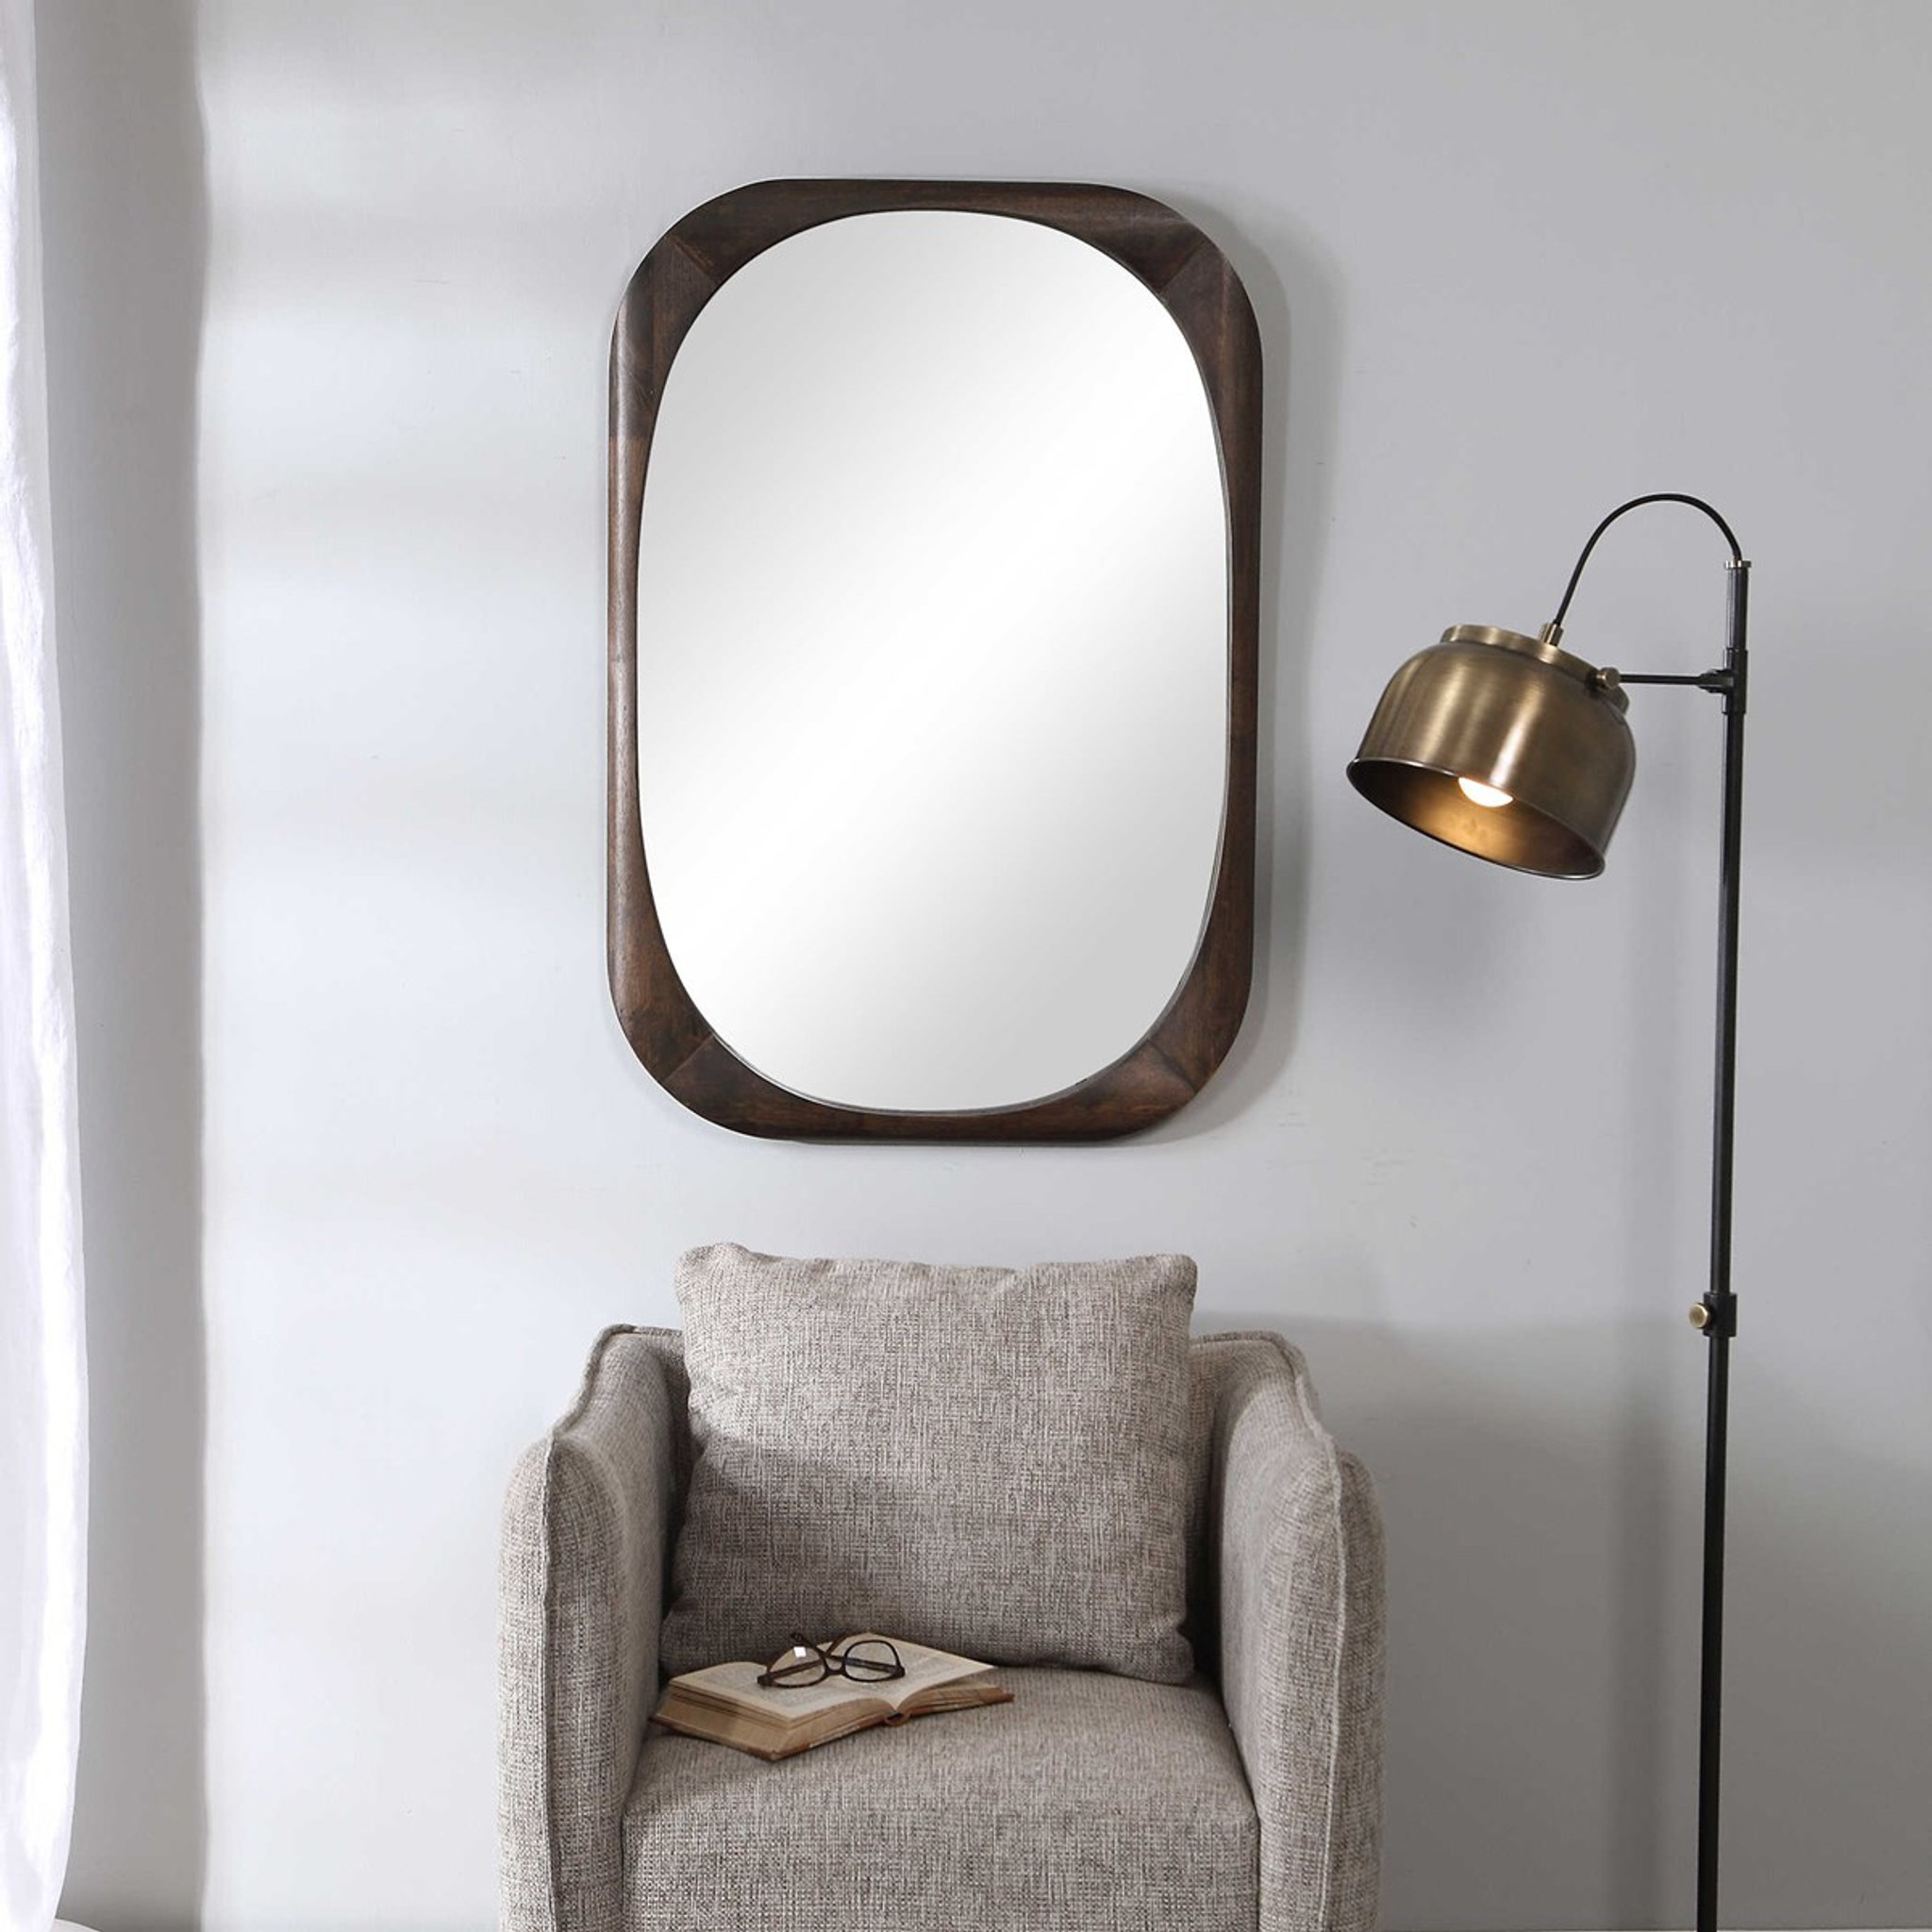 Uttermost 09552 Sheldon Mid-Century modern Mirror dark walnut stain wood